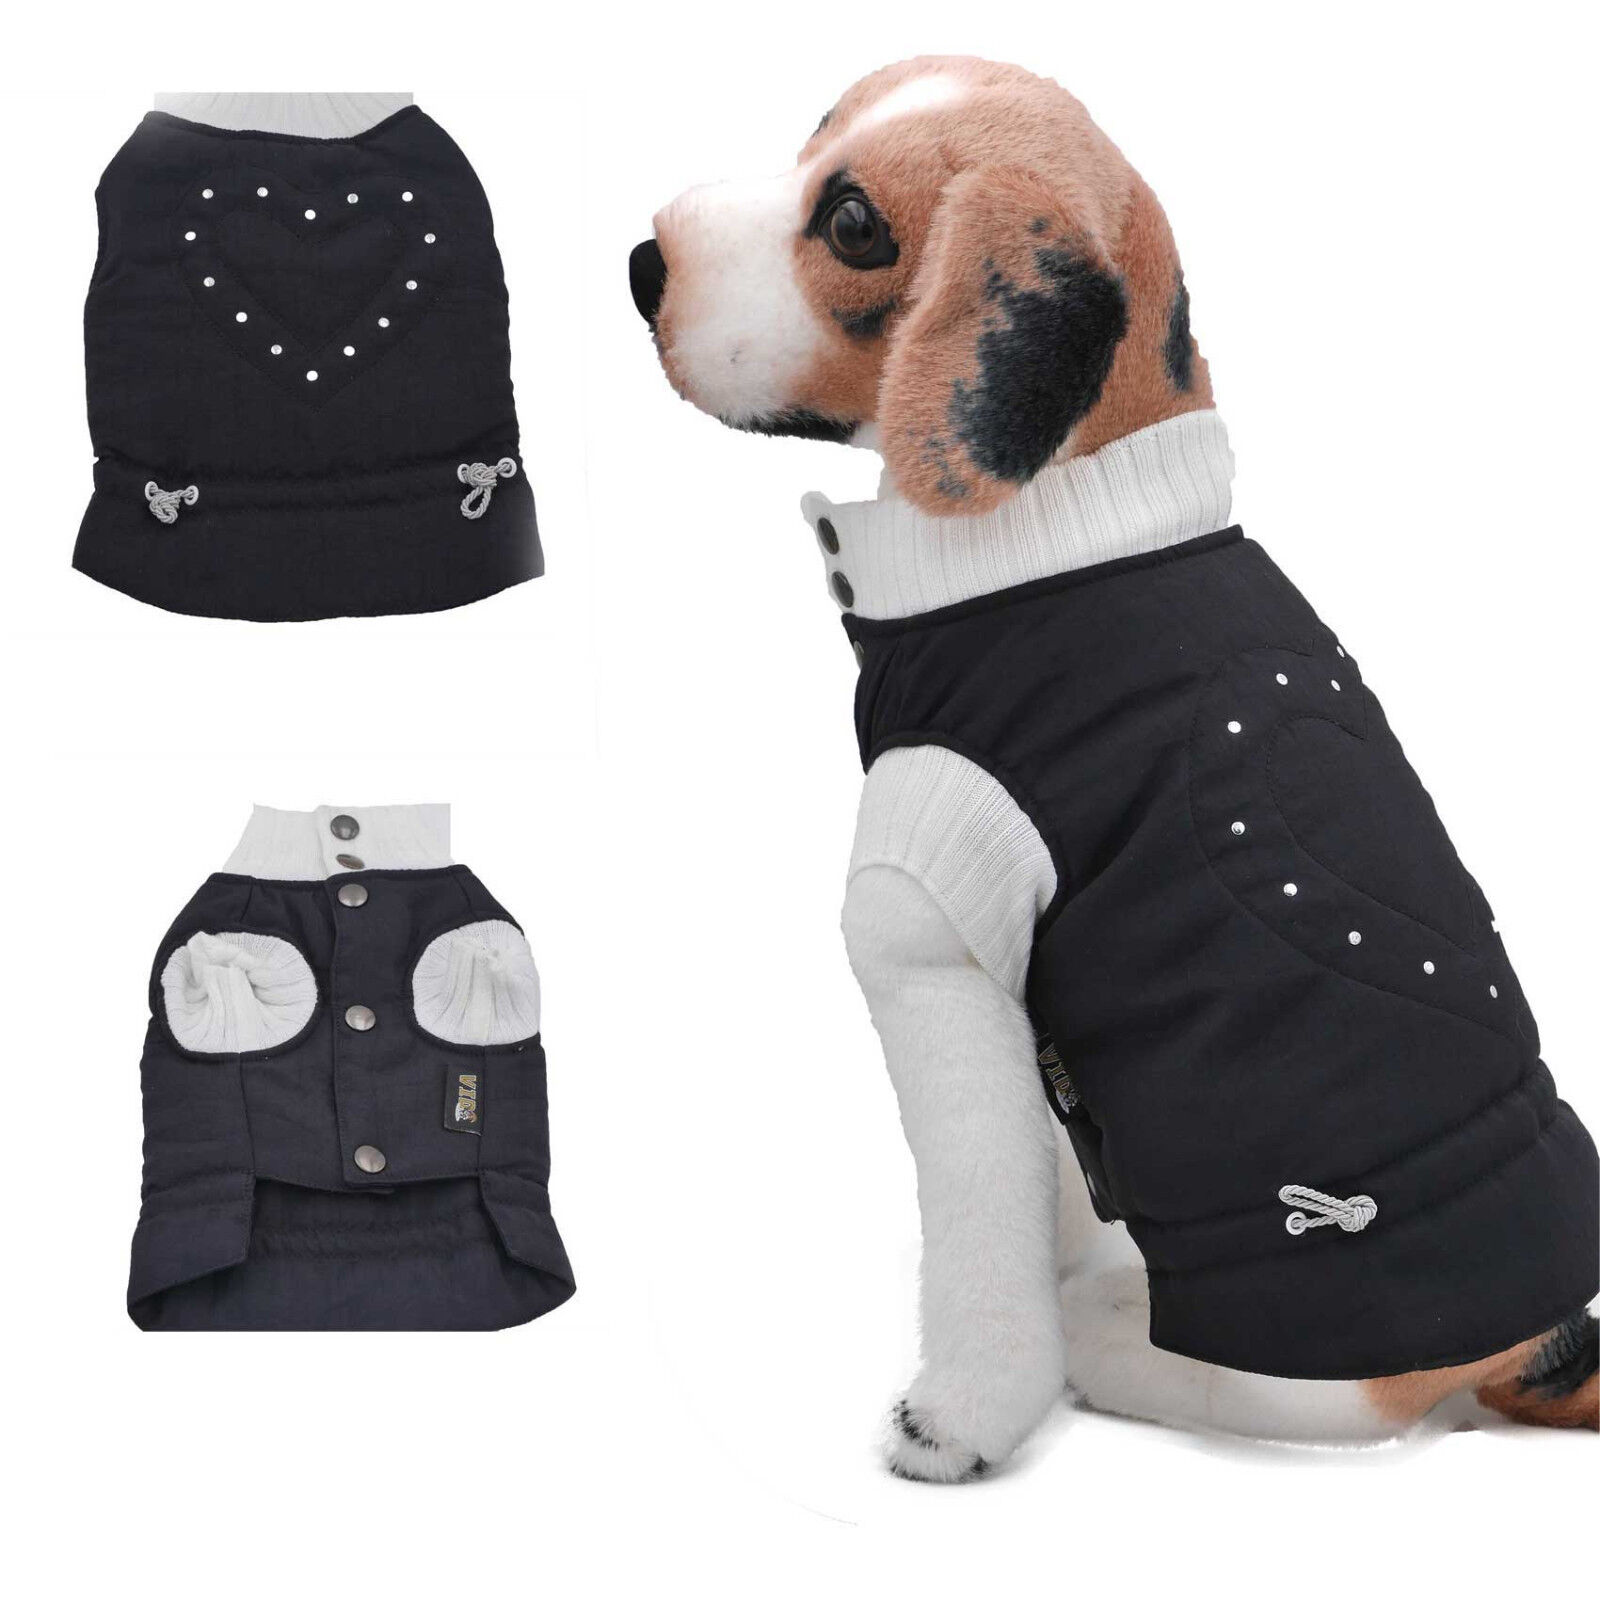 Hunde Winter Mantel Steppweste Dogi Fashion exklusiv schwarz Herzilein     Economy